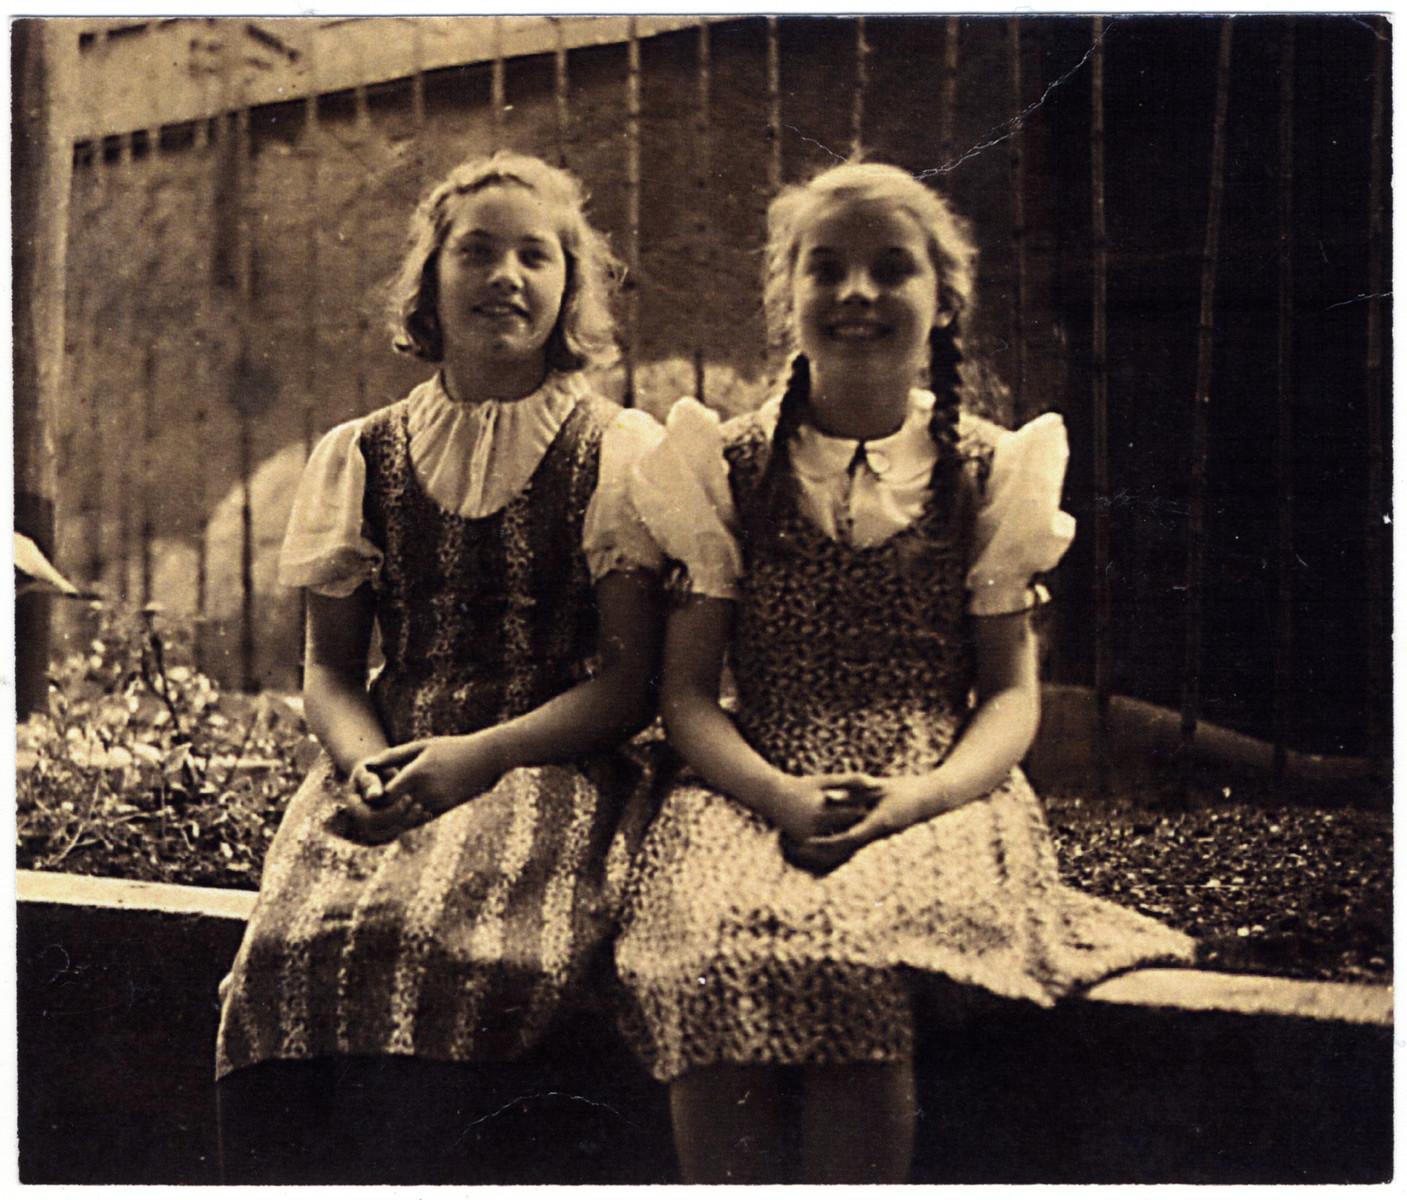 Hermine Liska (née Oberweger), right, and her friend Astrid (Tridi) Künstner.